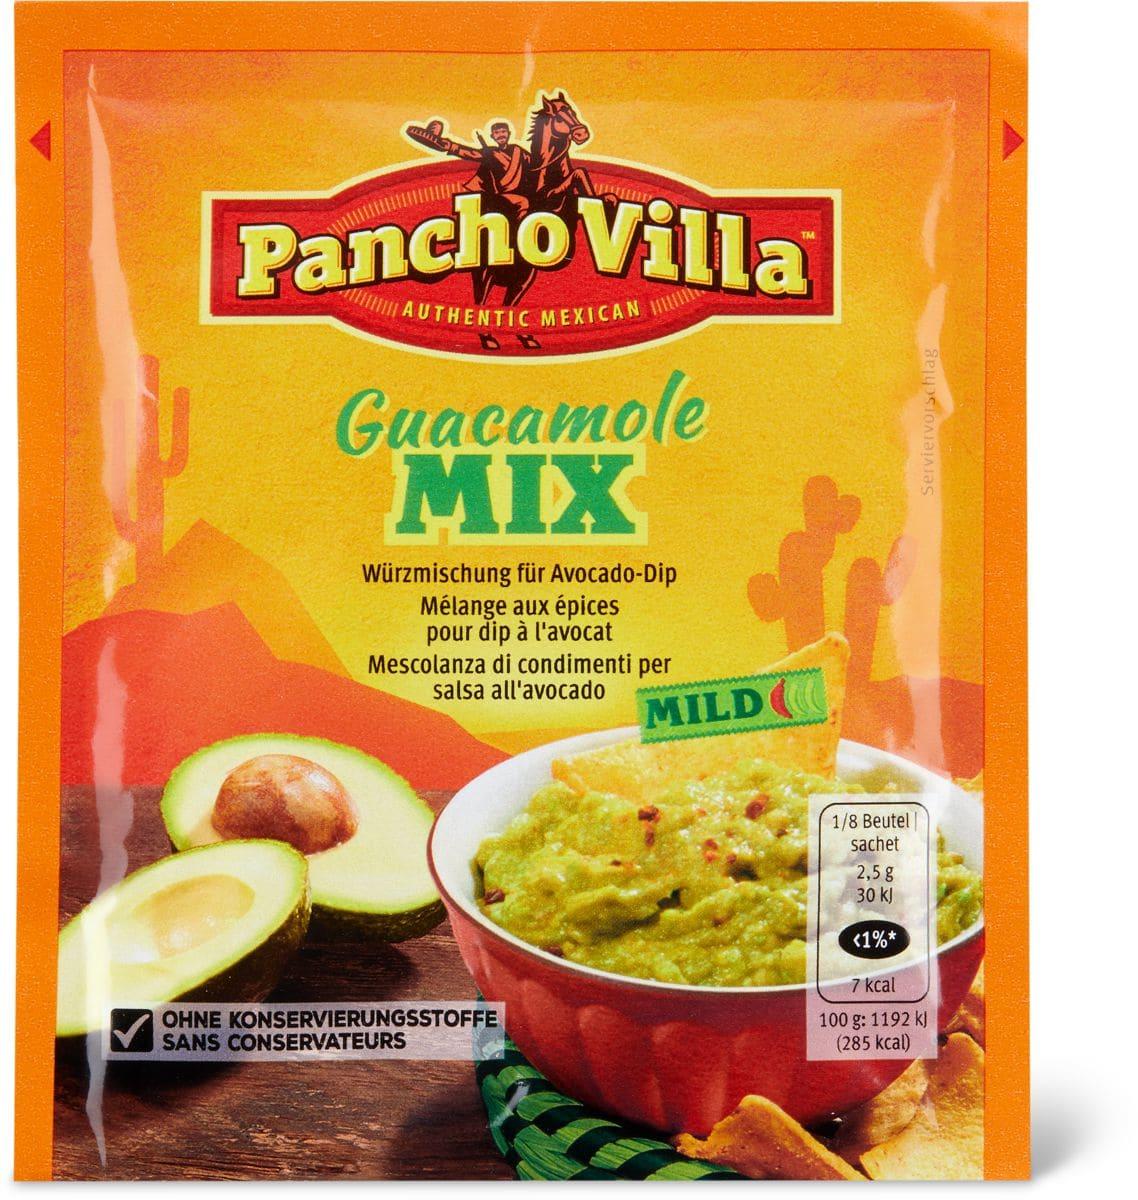 Pancho Villa Guacamole Mix